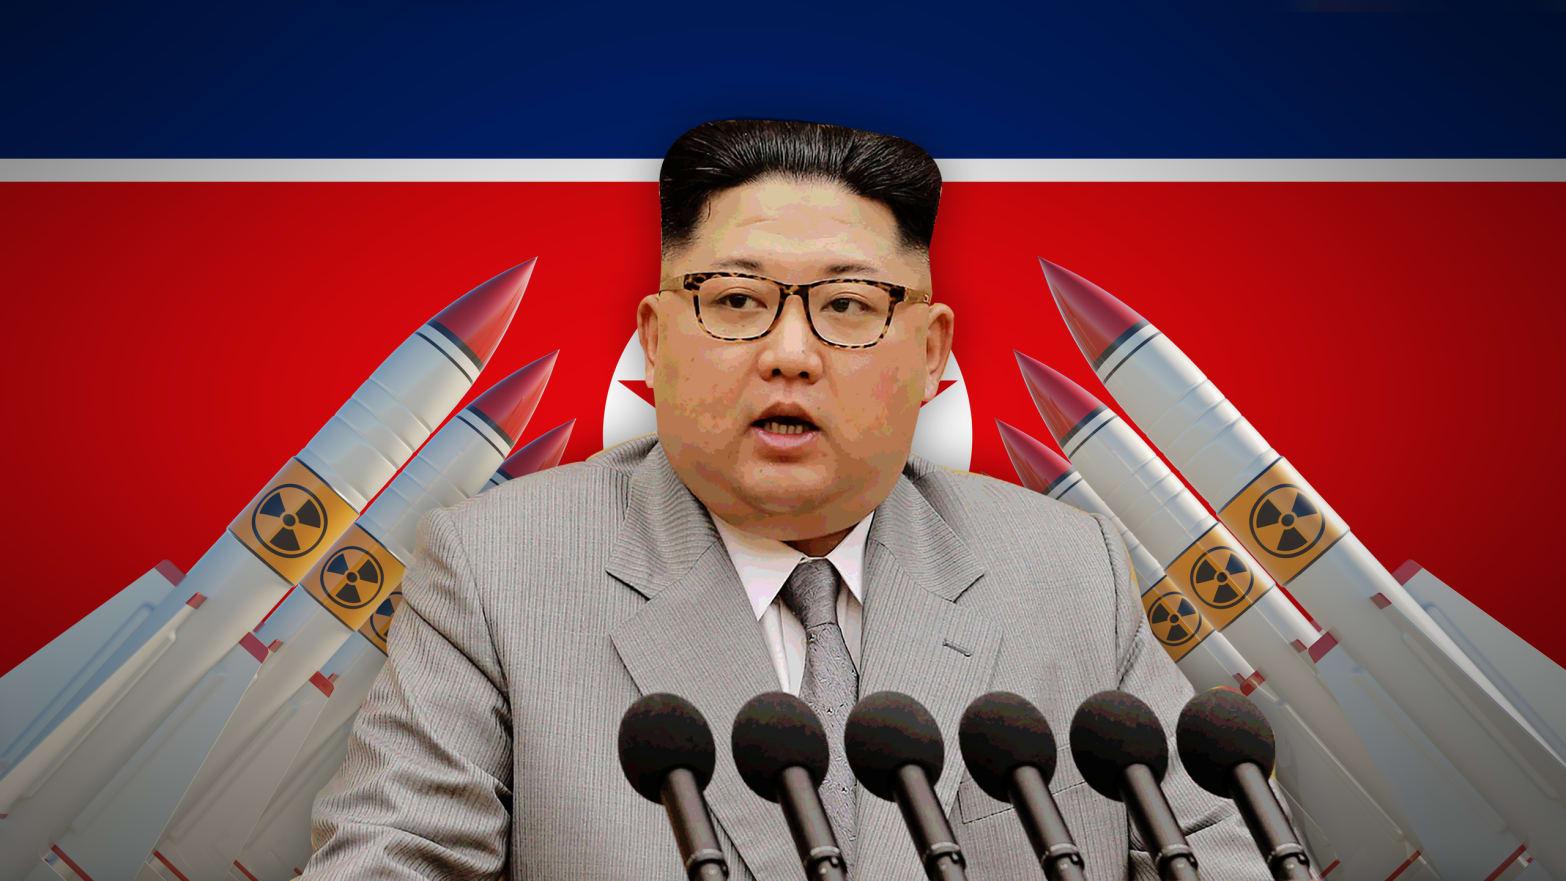 Kim Jong Un's Nice Guy (With a Nuclear Button) Act